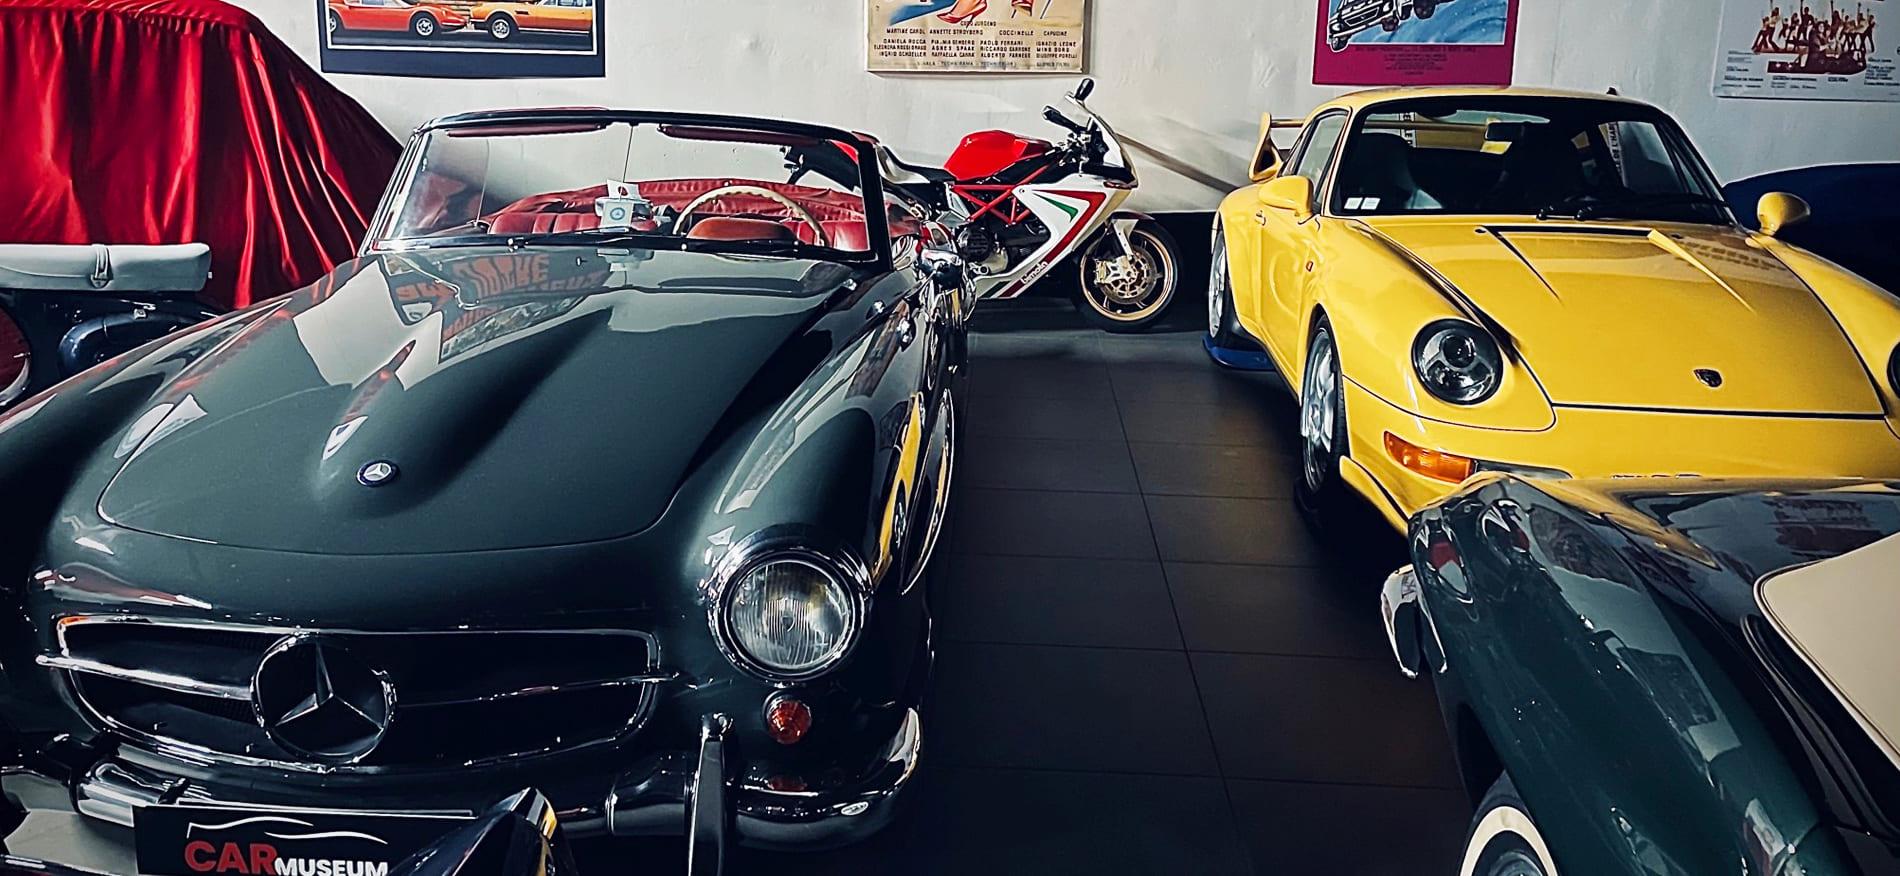 Gardiennage Auto Monaco